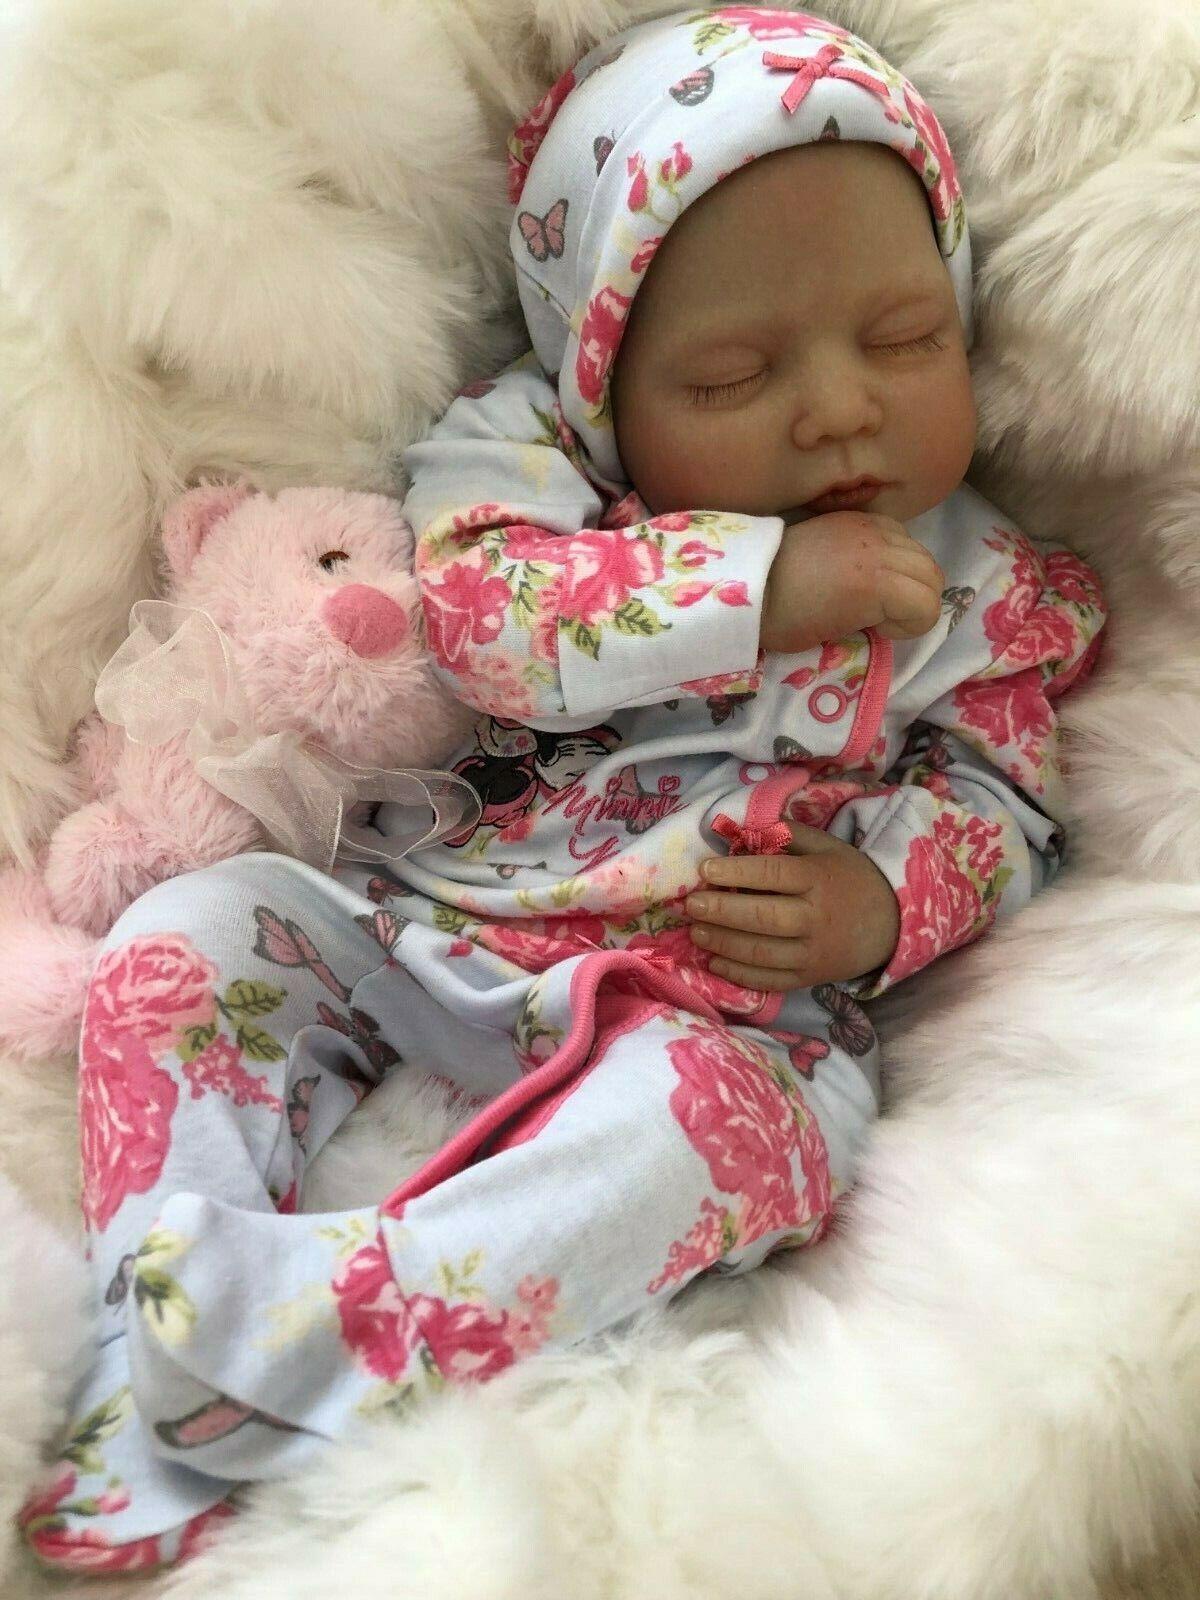 "CHERISH DOLLS ANYA FULLY REBORNED BABY FAKE BABIES REALISTIC 22"" BIG REBORN GIRL"